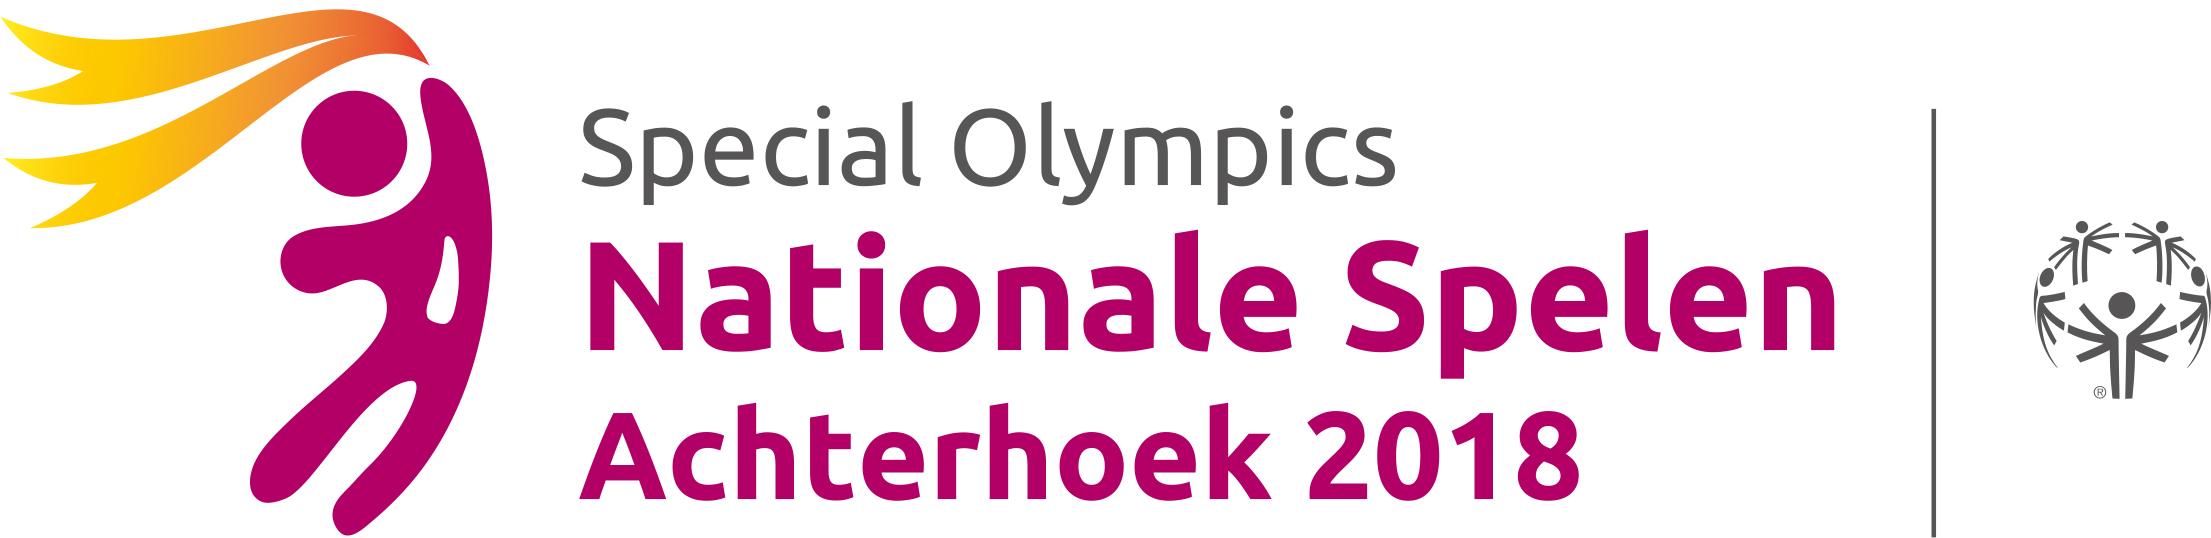 Special Olympics Nationale Spelen